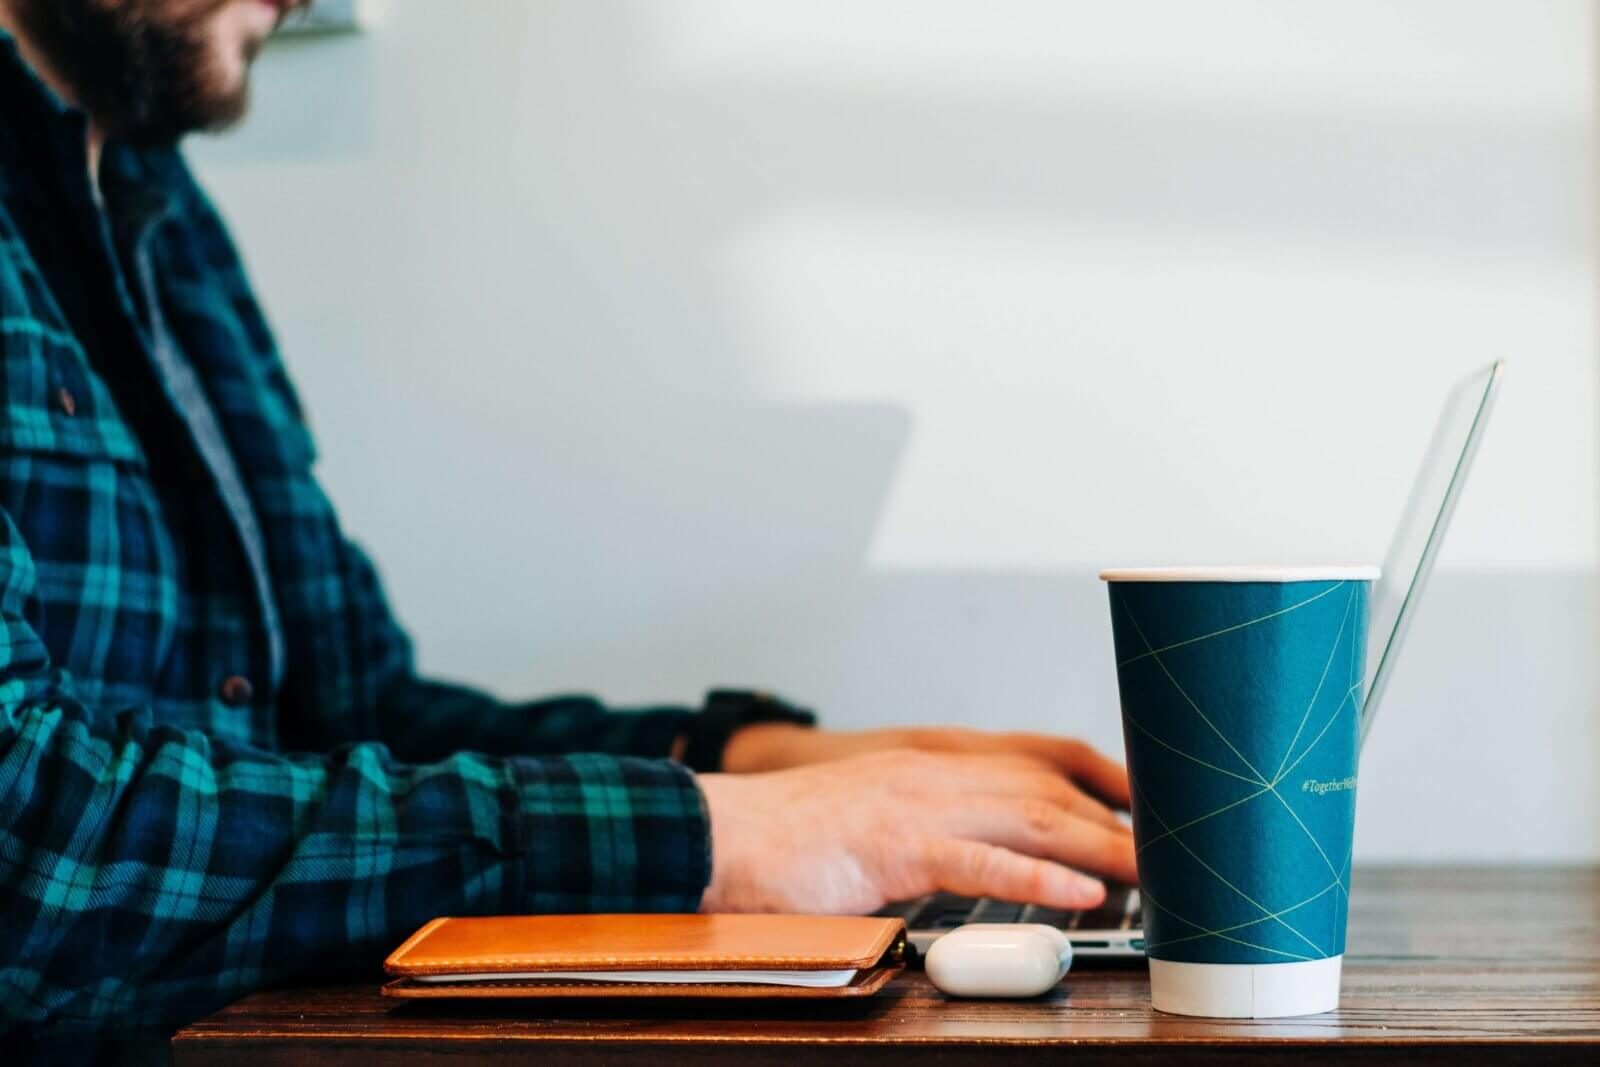 Интернет заработок: ТОП способов заработать в интернете